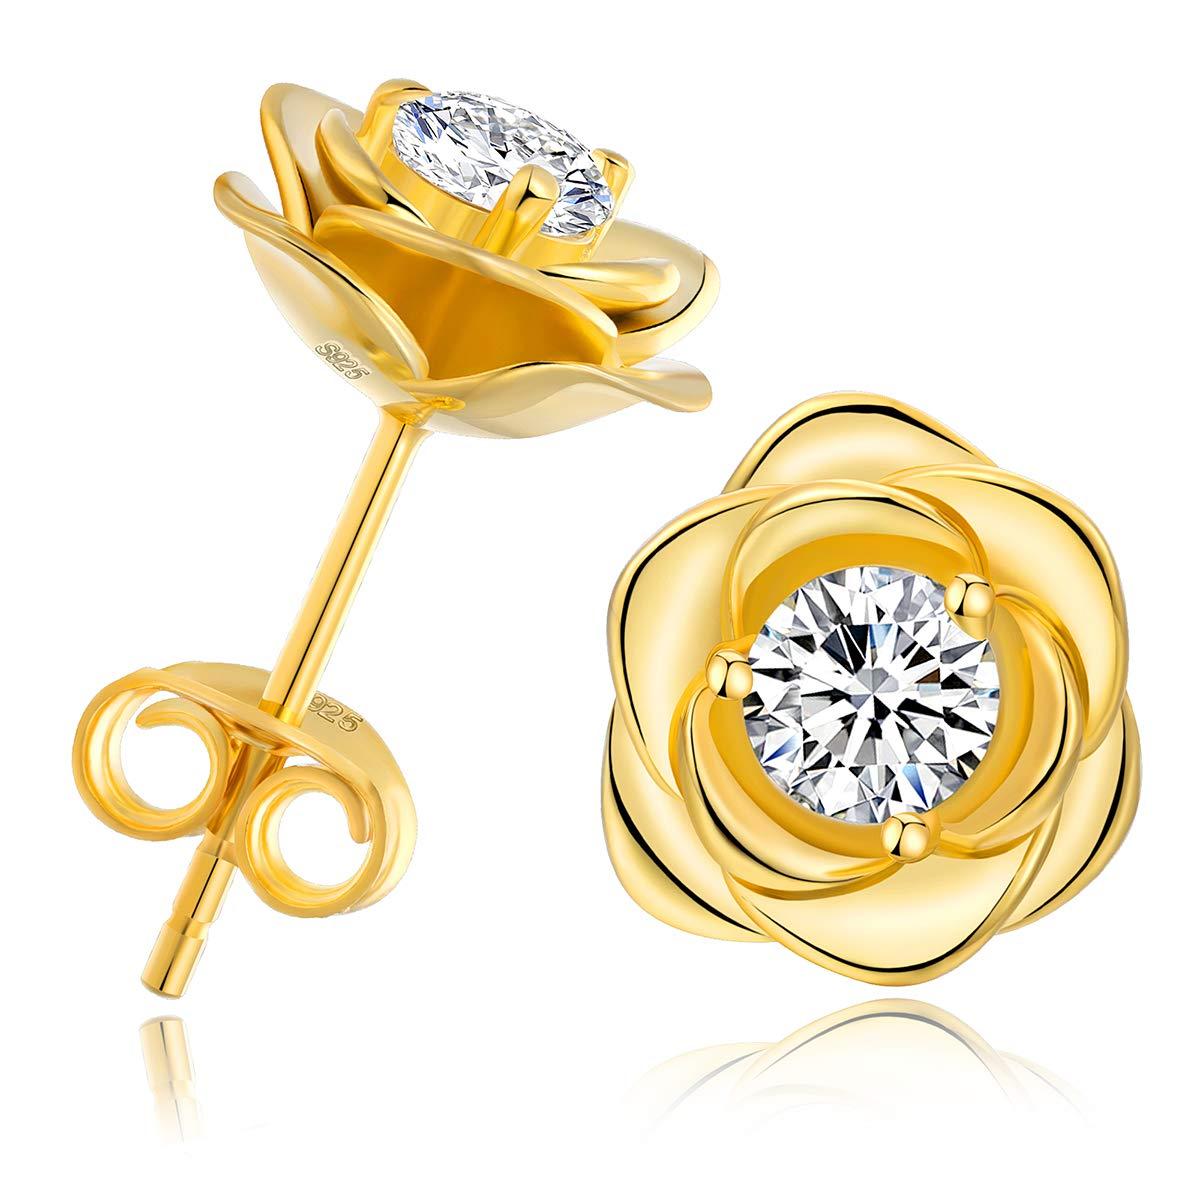 Rose Flower Stud Earrings - 18k Gold Plated 925 Sterling Silver Pure Brilliance CZ Stud Earrings, Hypoallergenic & Nickel Free & Fake Diamond Earrings for Women